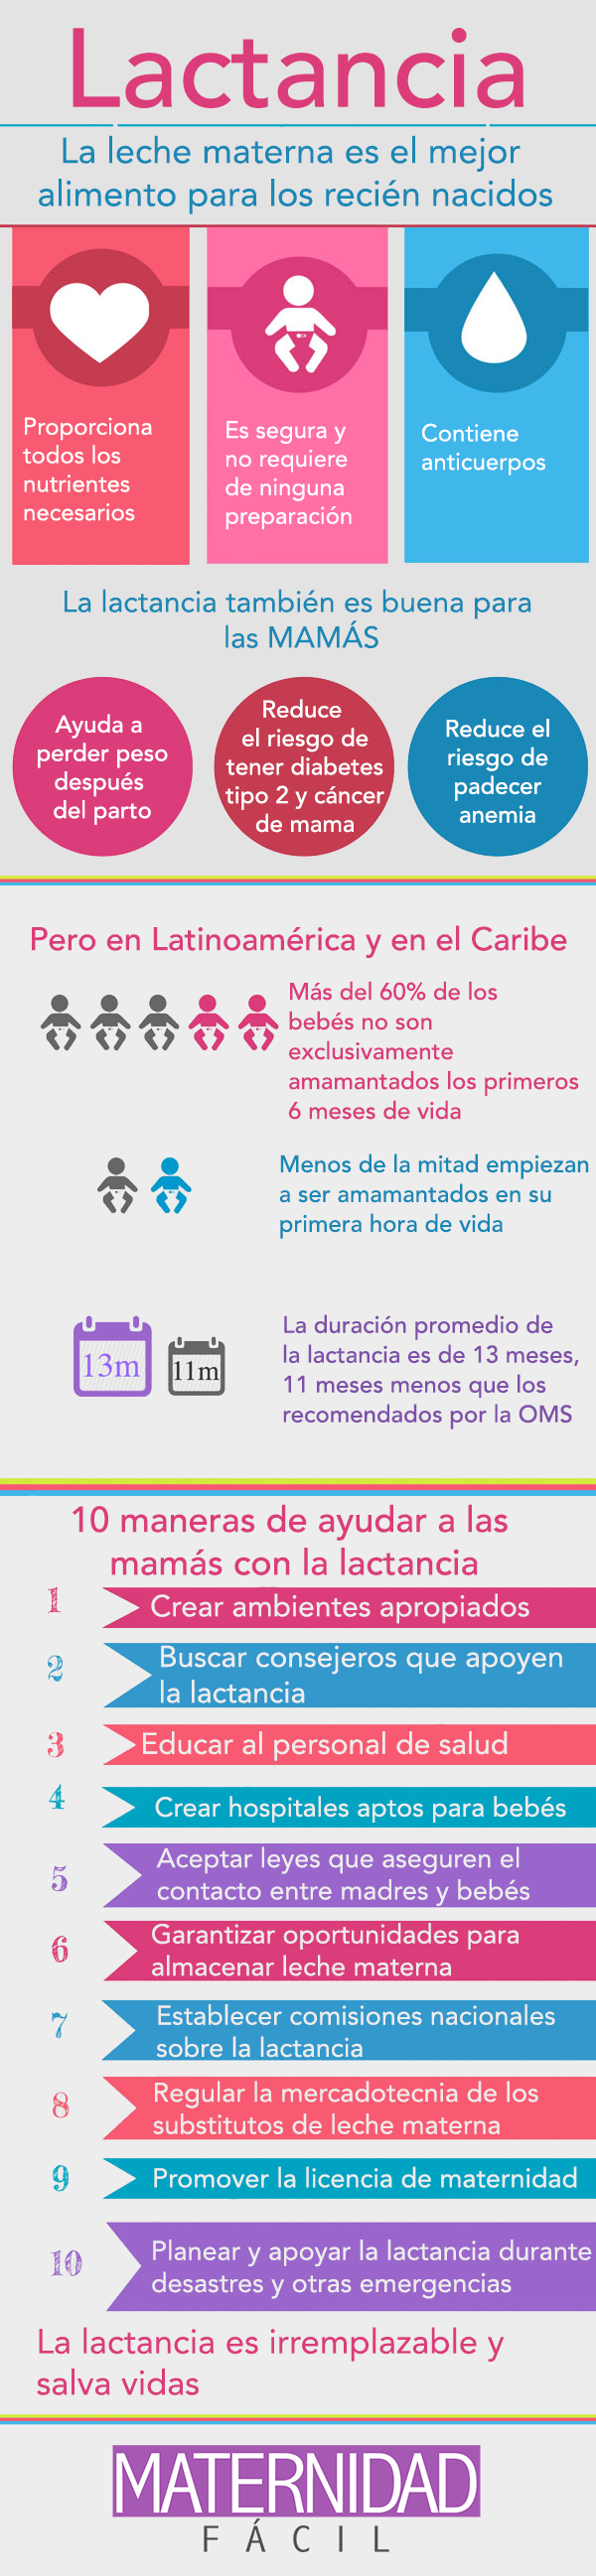 infografia lactancia materna